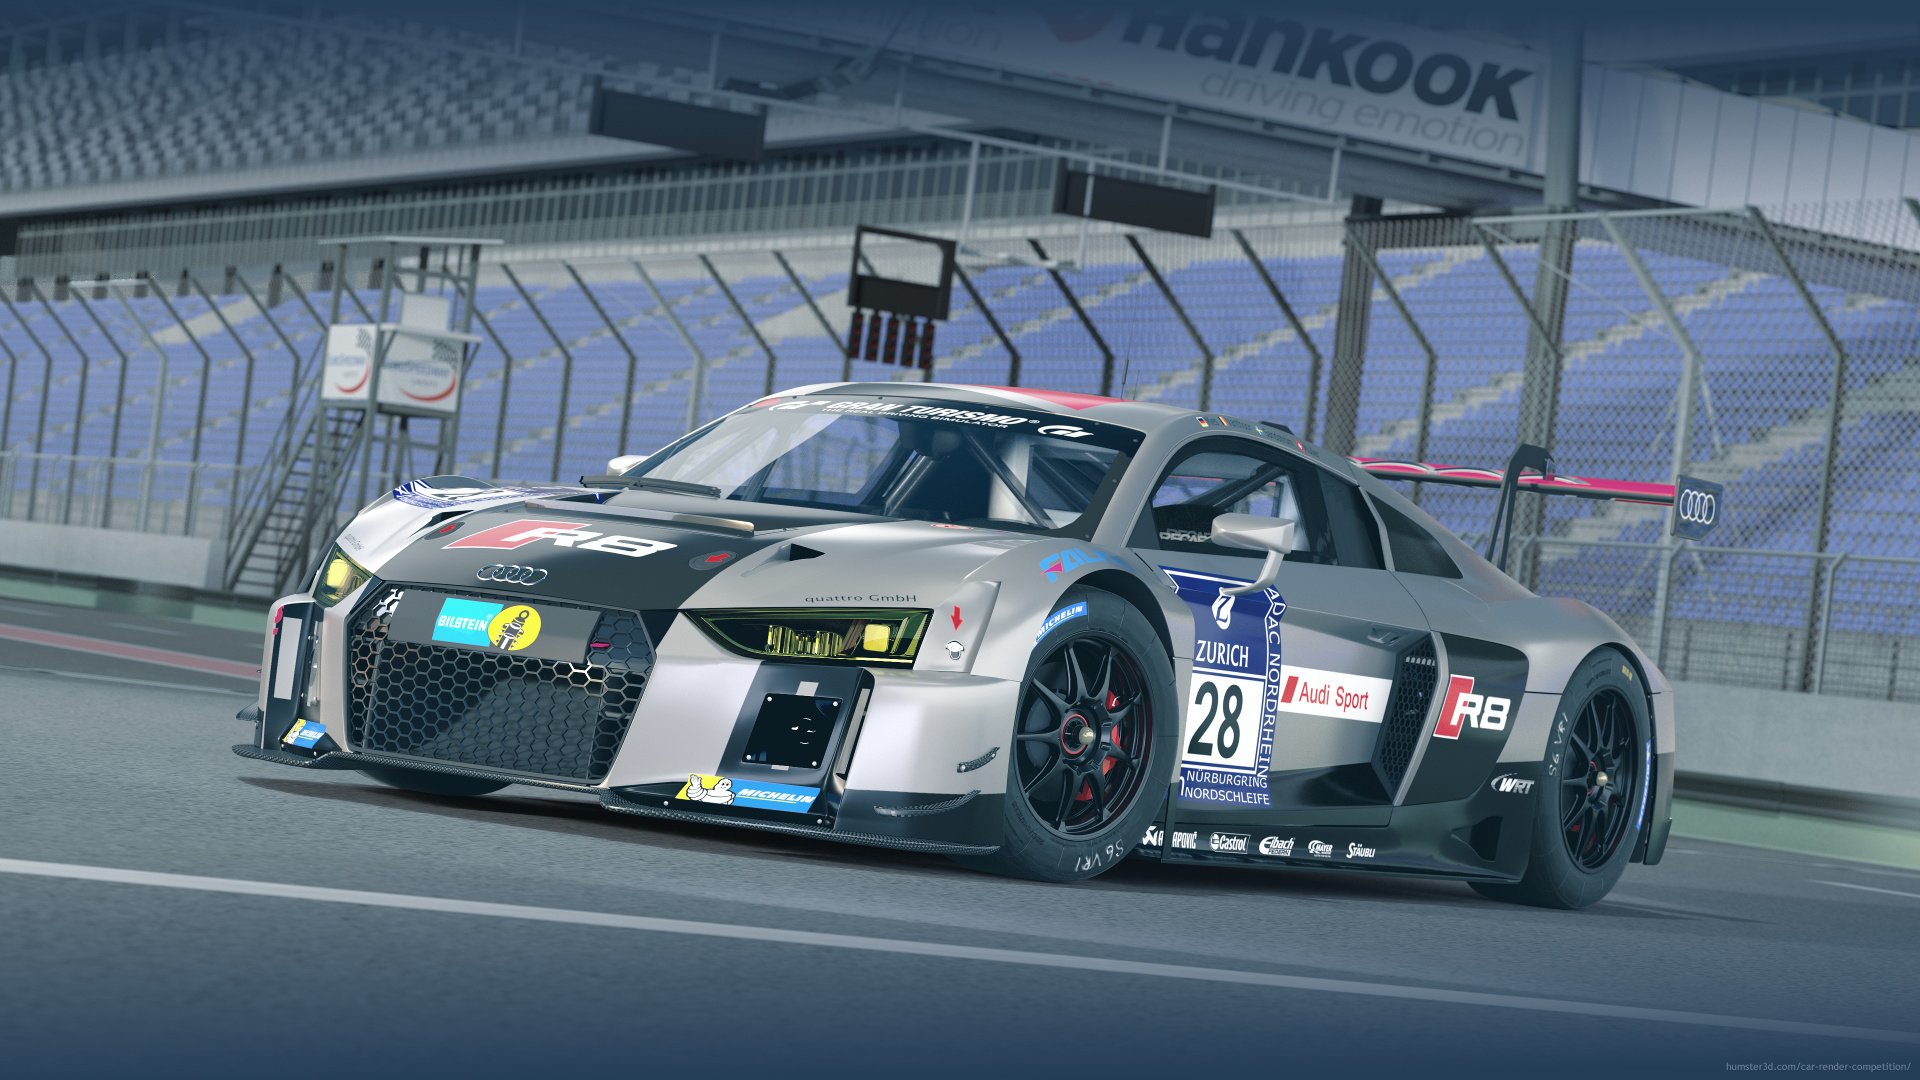 Audi R8 LMS - Champion 2015 24h Nürburgring 3d art